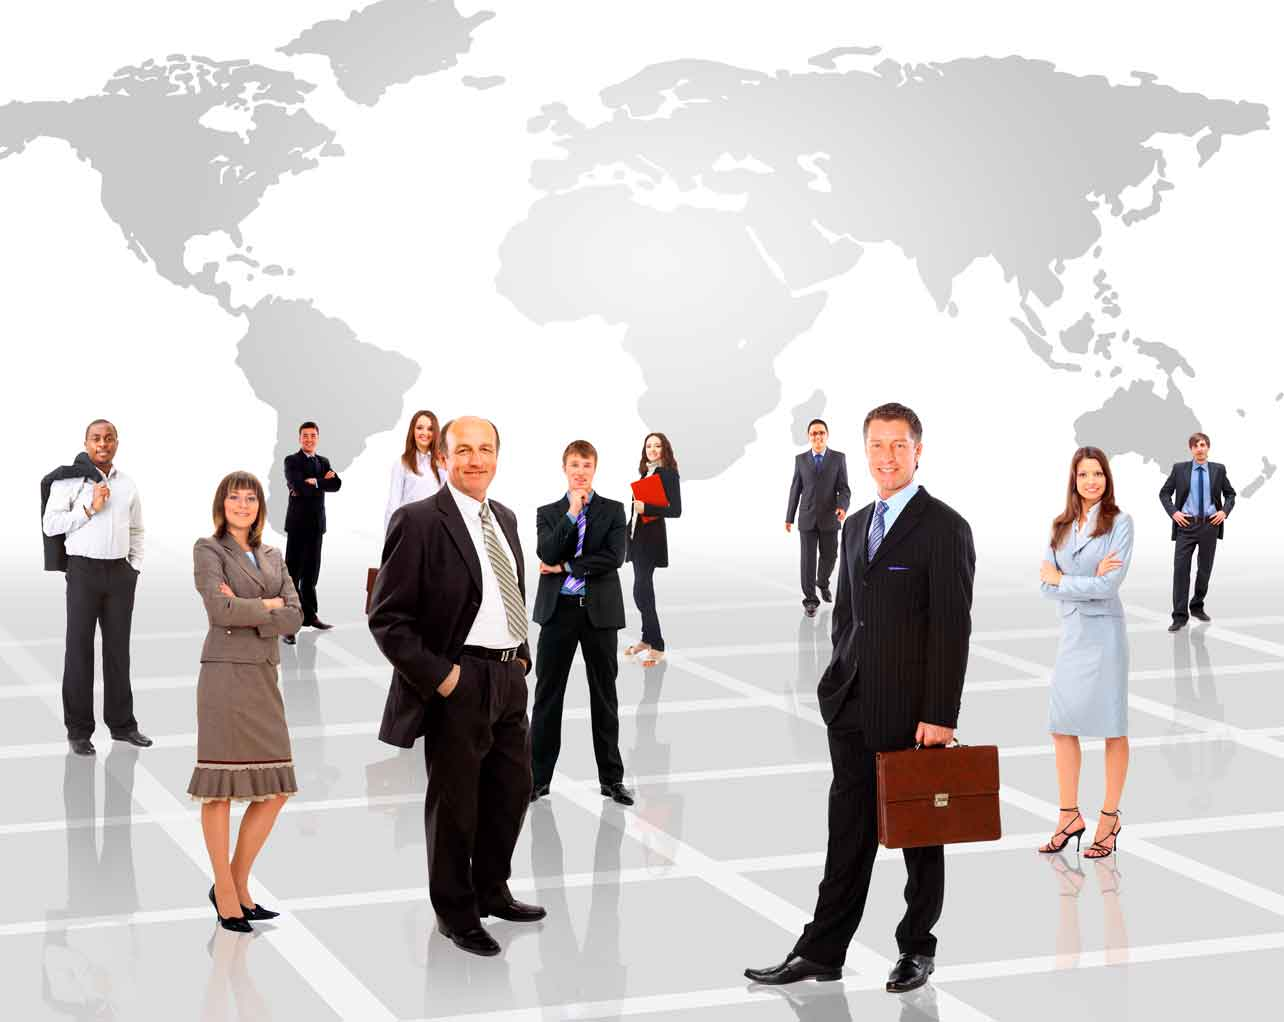 asociate-cluster-idia-ventajas-beneficios-colaboracion